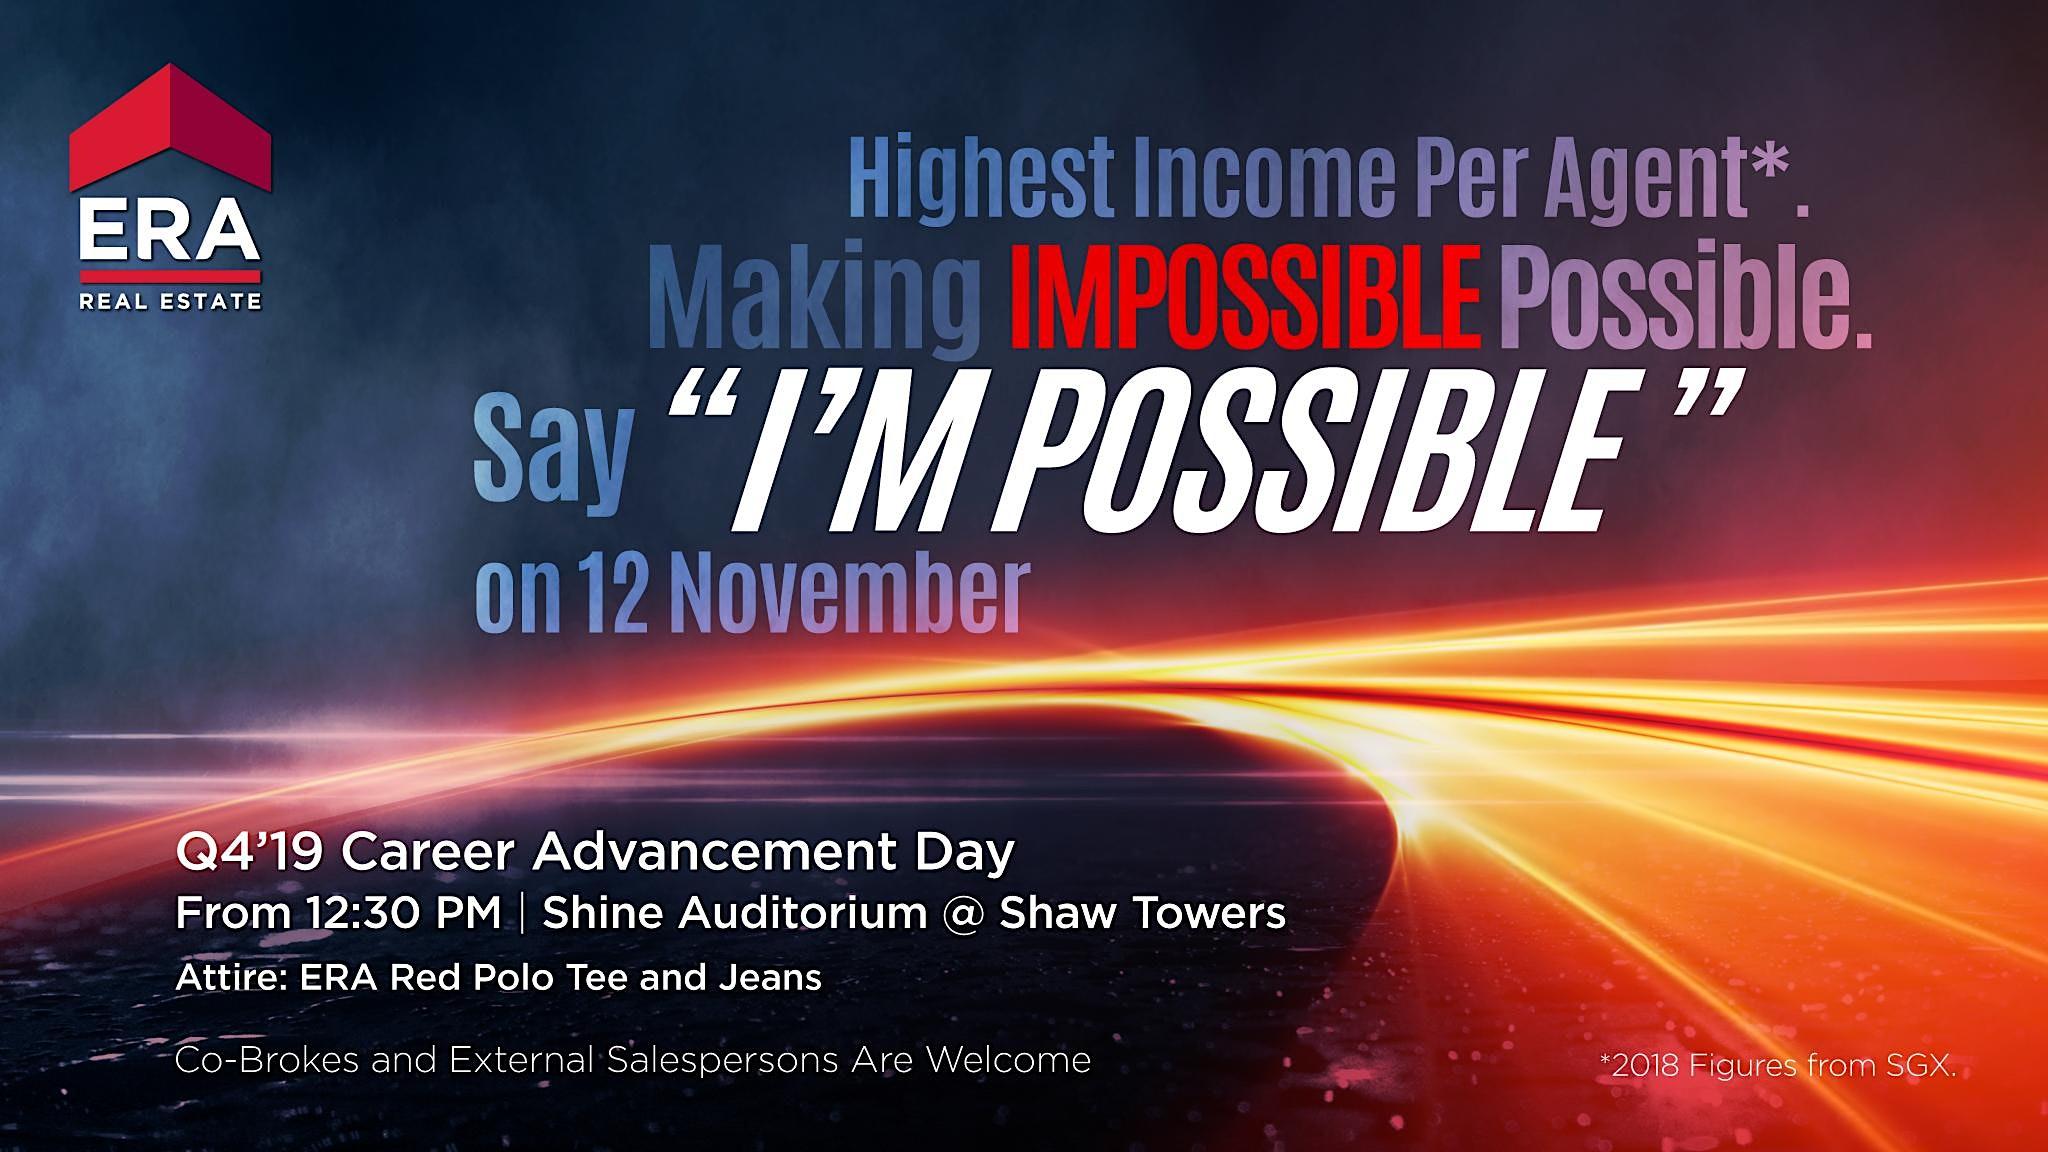 Q4'19 Career Advancement Day